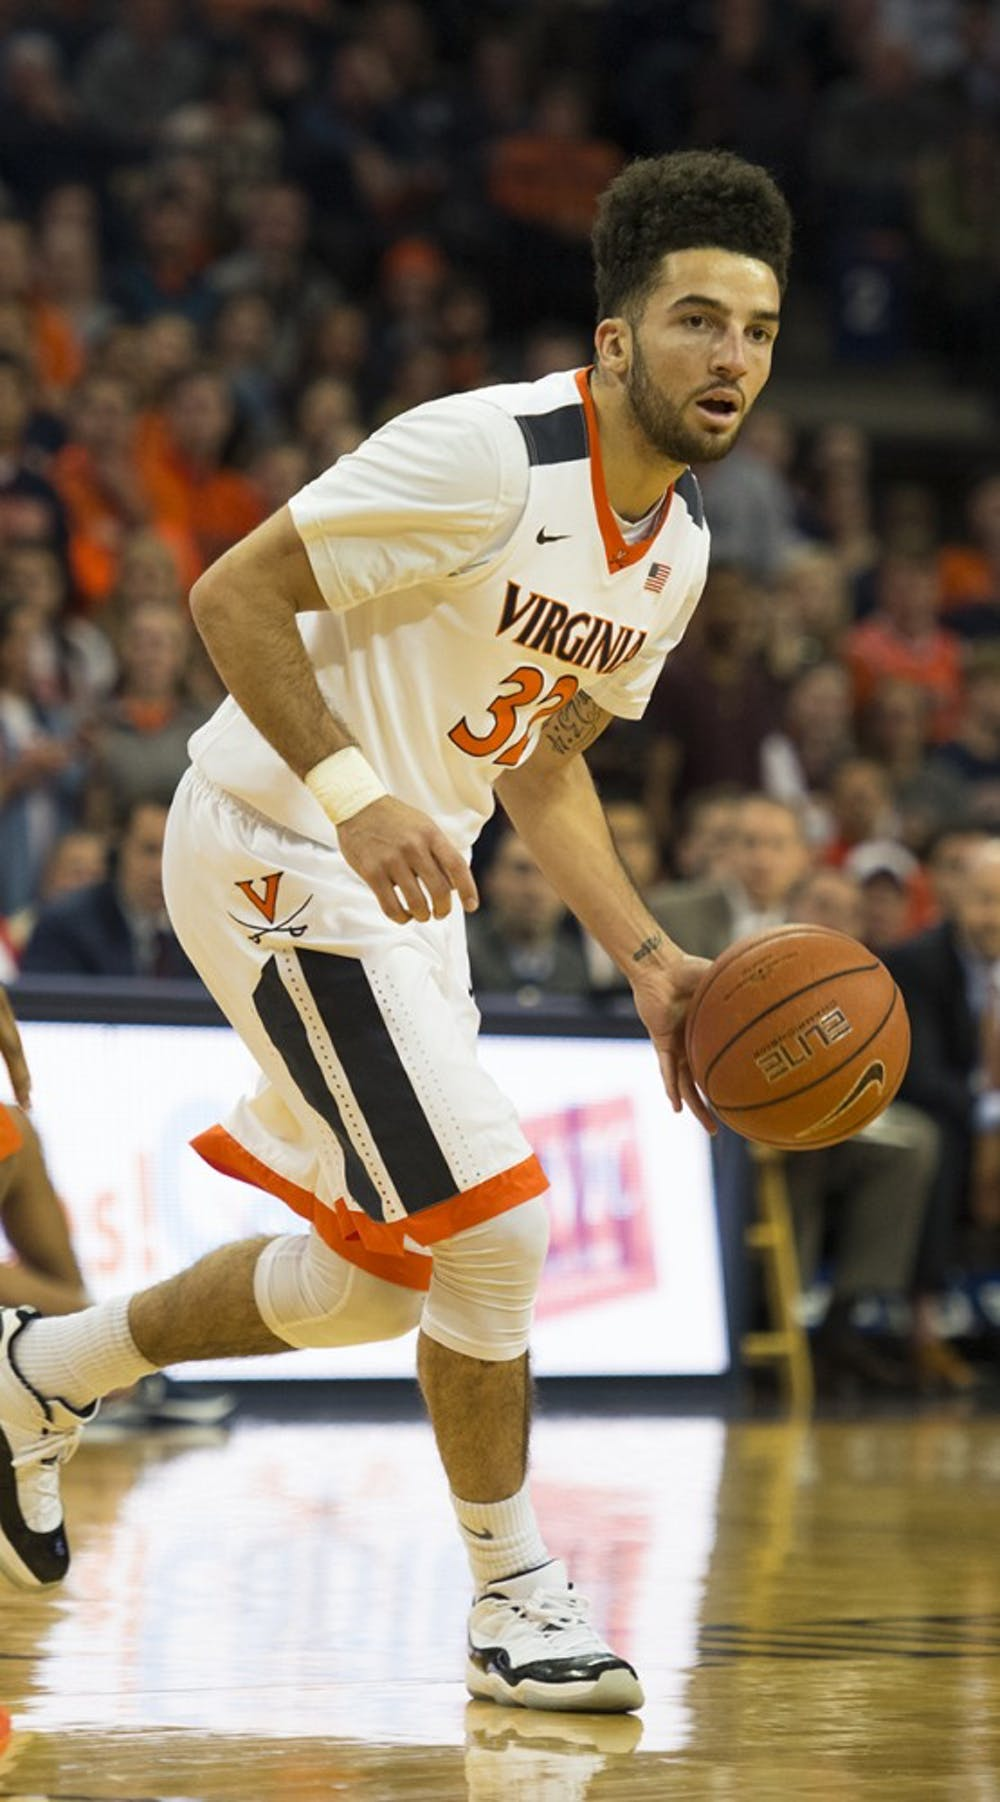 <p>Senior guard London Perrantes is the elder statesman for Virginia basketball this season.</p>